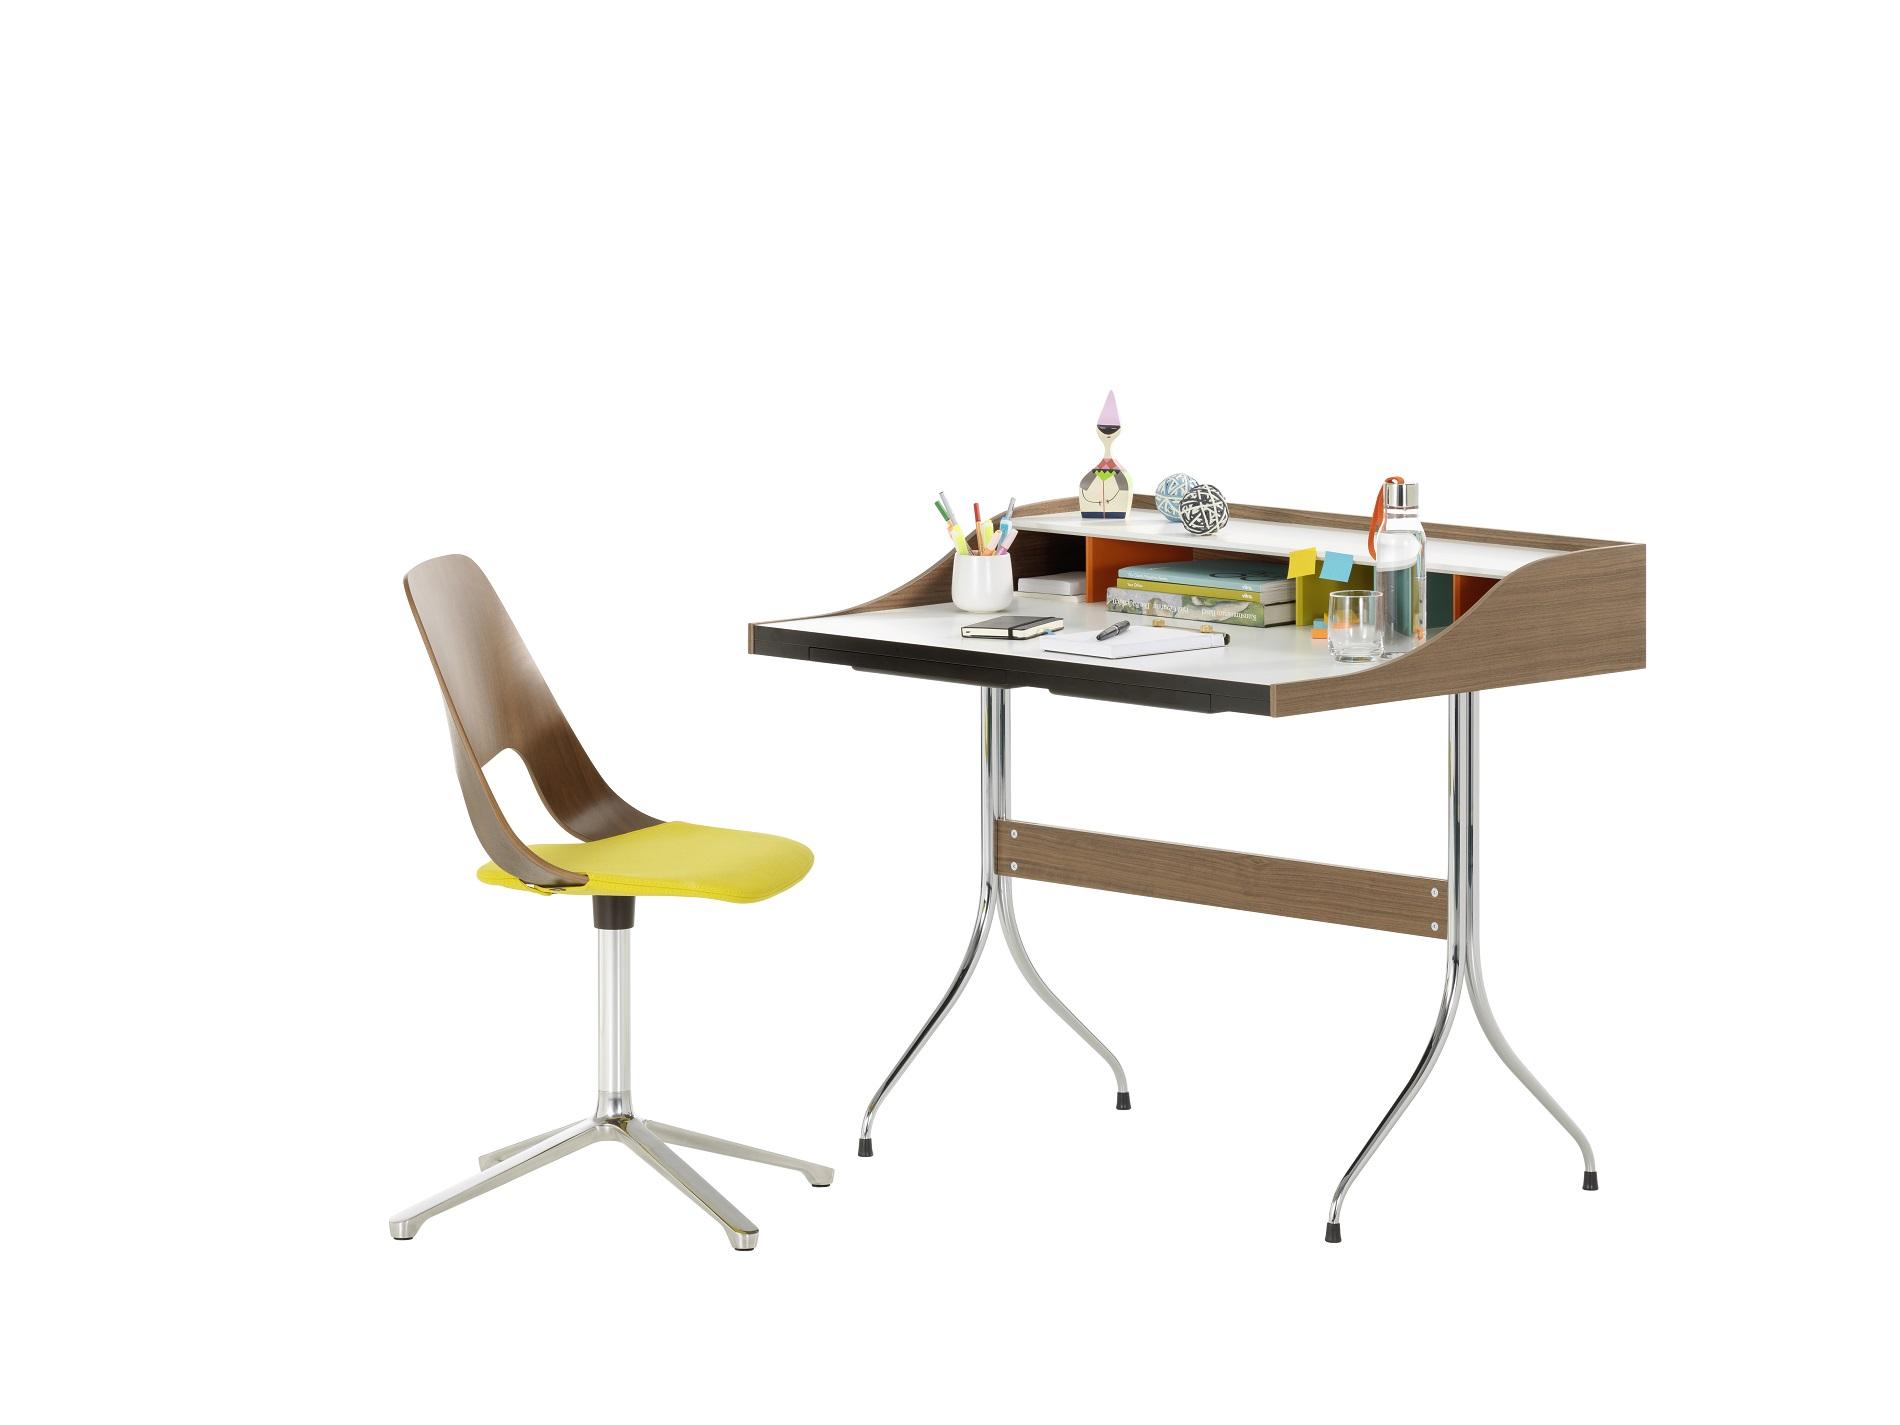 Vitra schreibtisch home desk designikonen designm bel shop for Vitra home desk replica